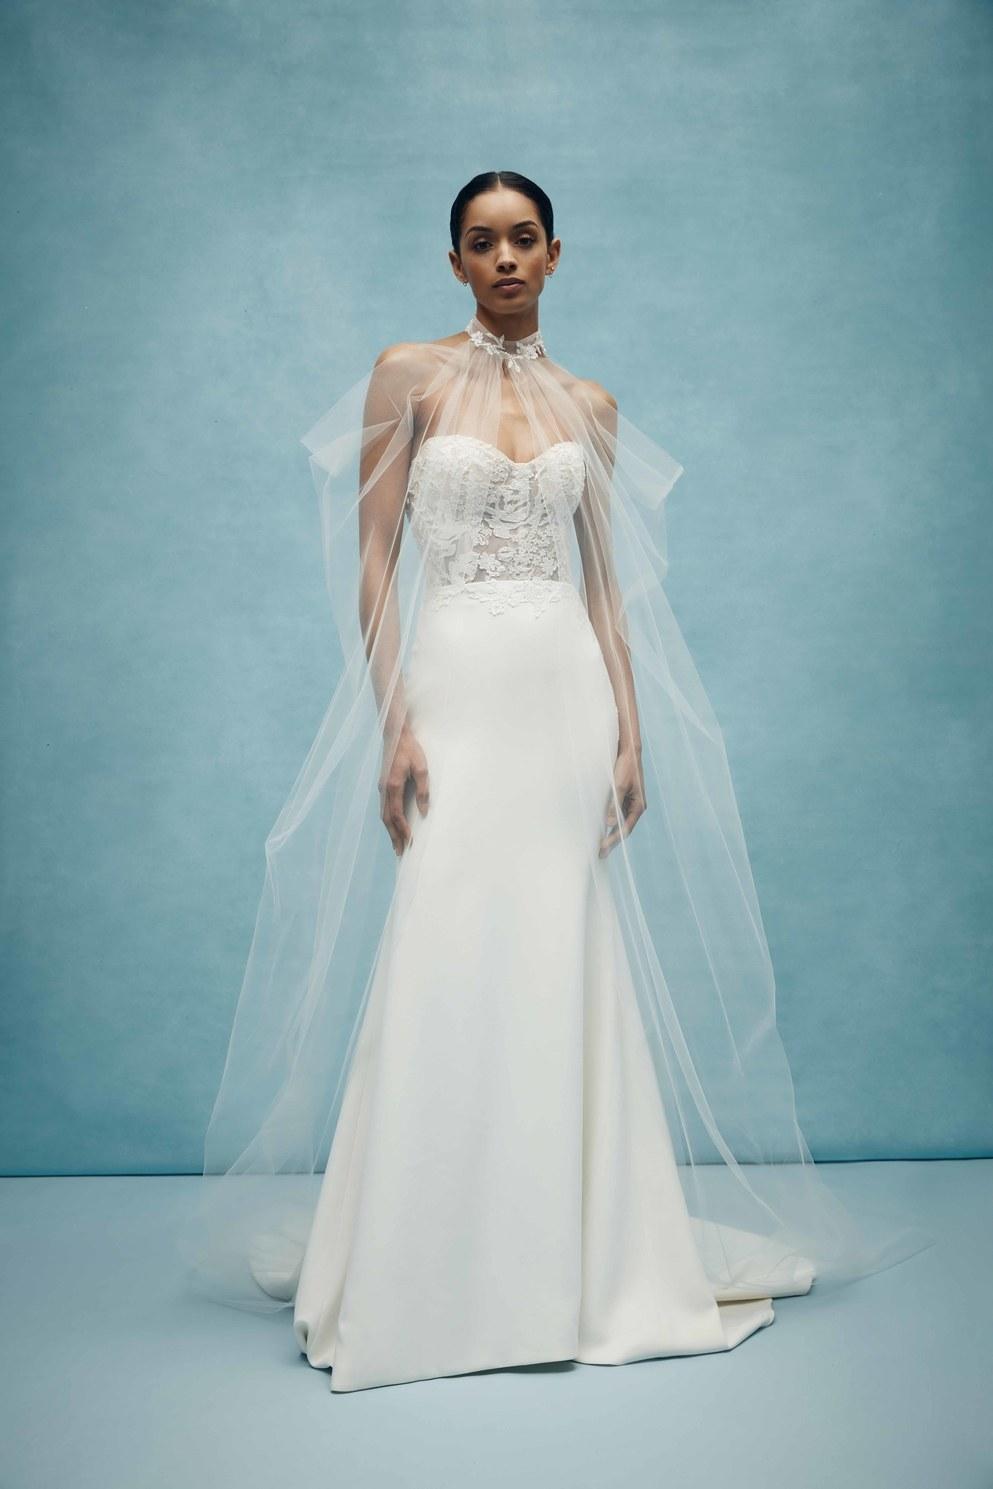 anne-barge-wedding-dresses-spring-2020-001.jpg